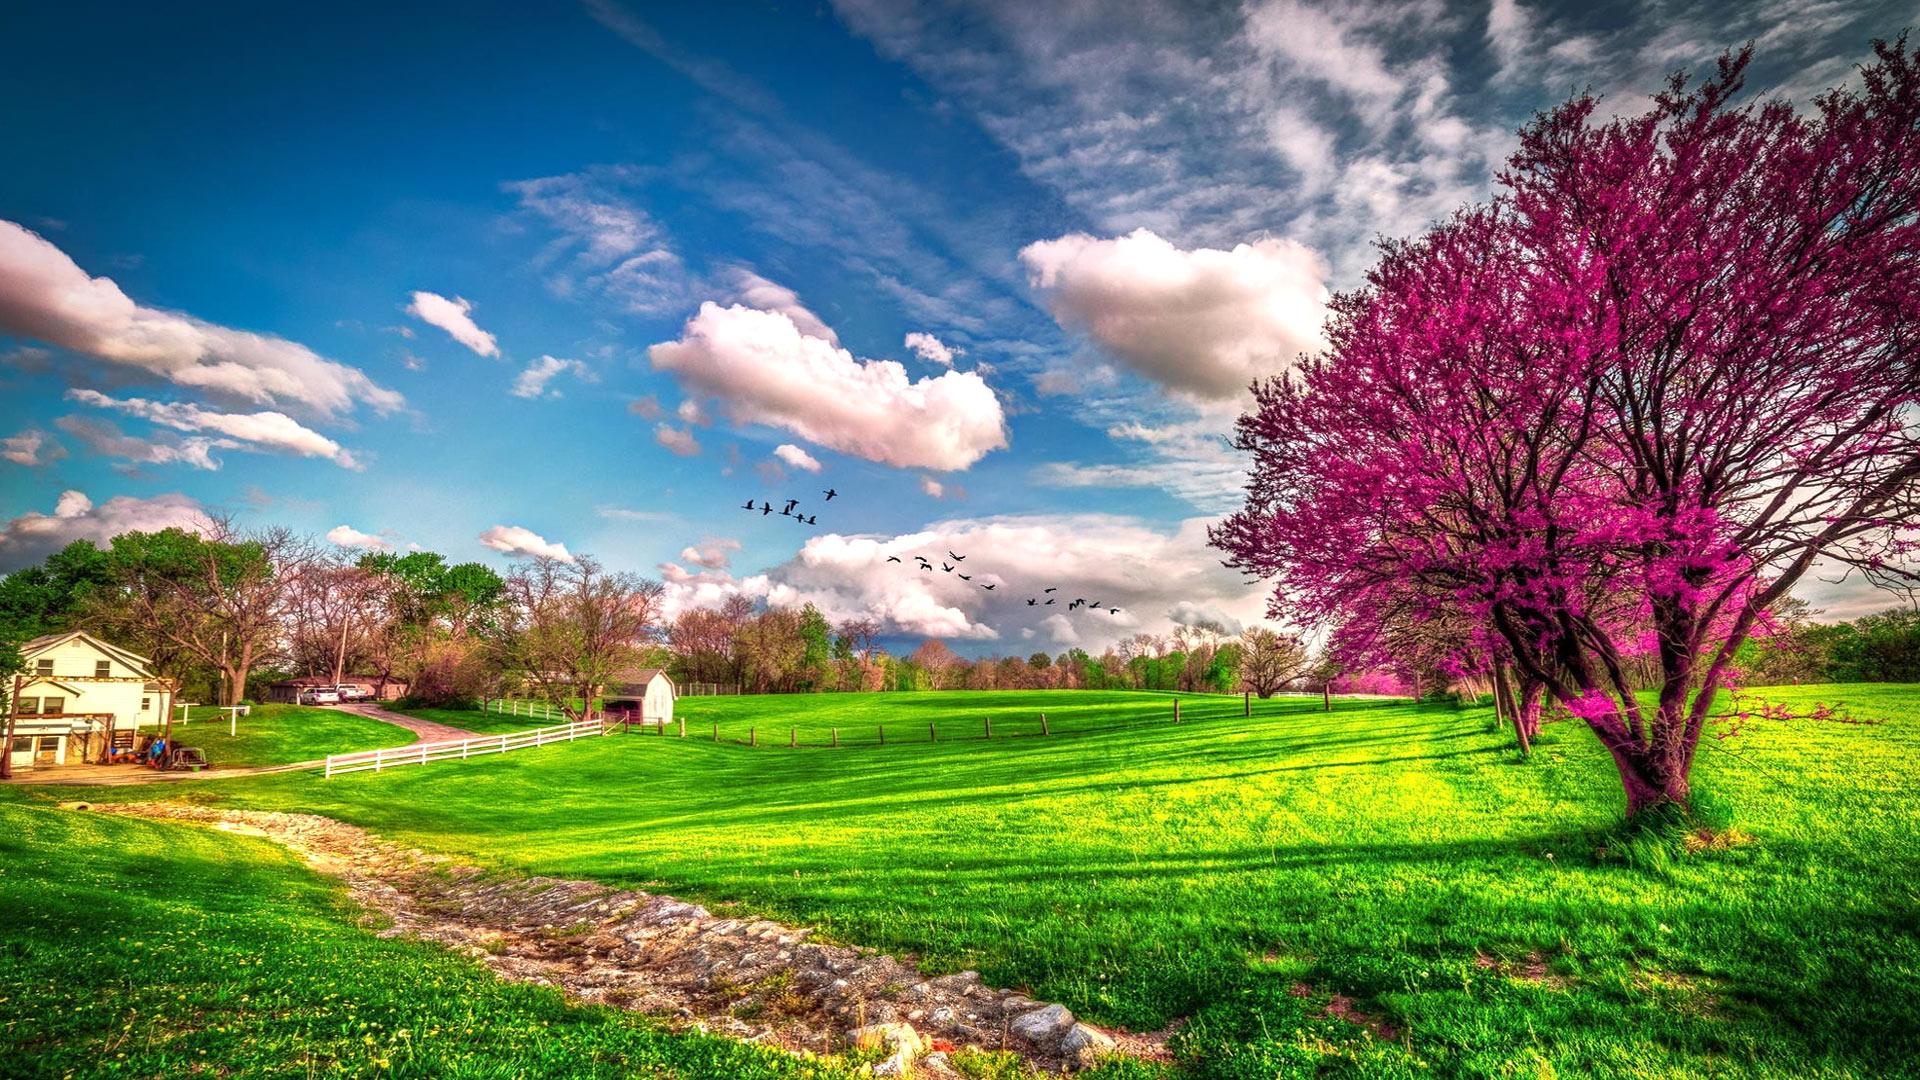 beautiful scenery wallpaper for - photo #43